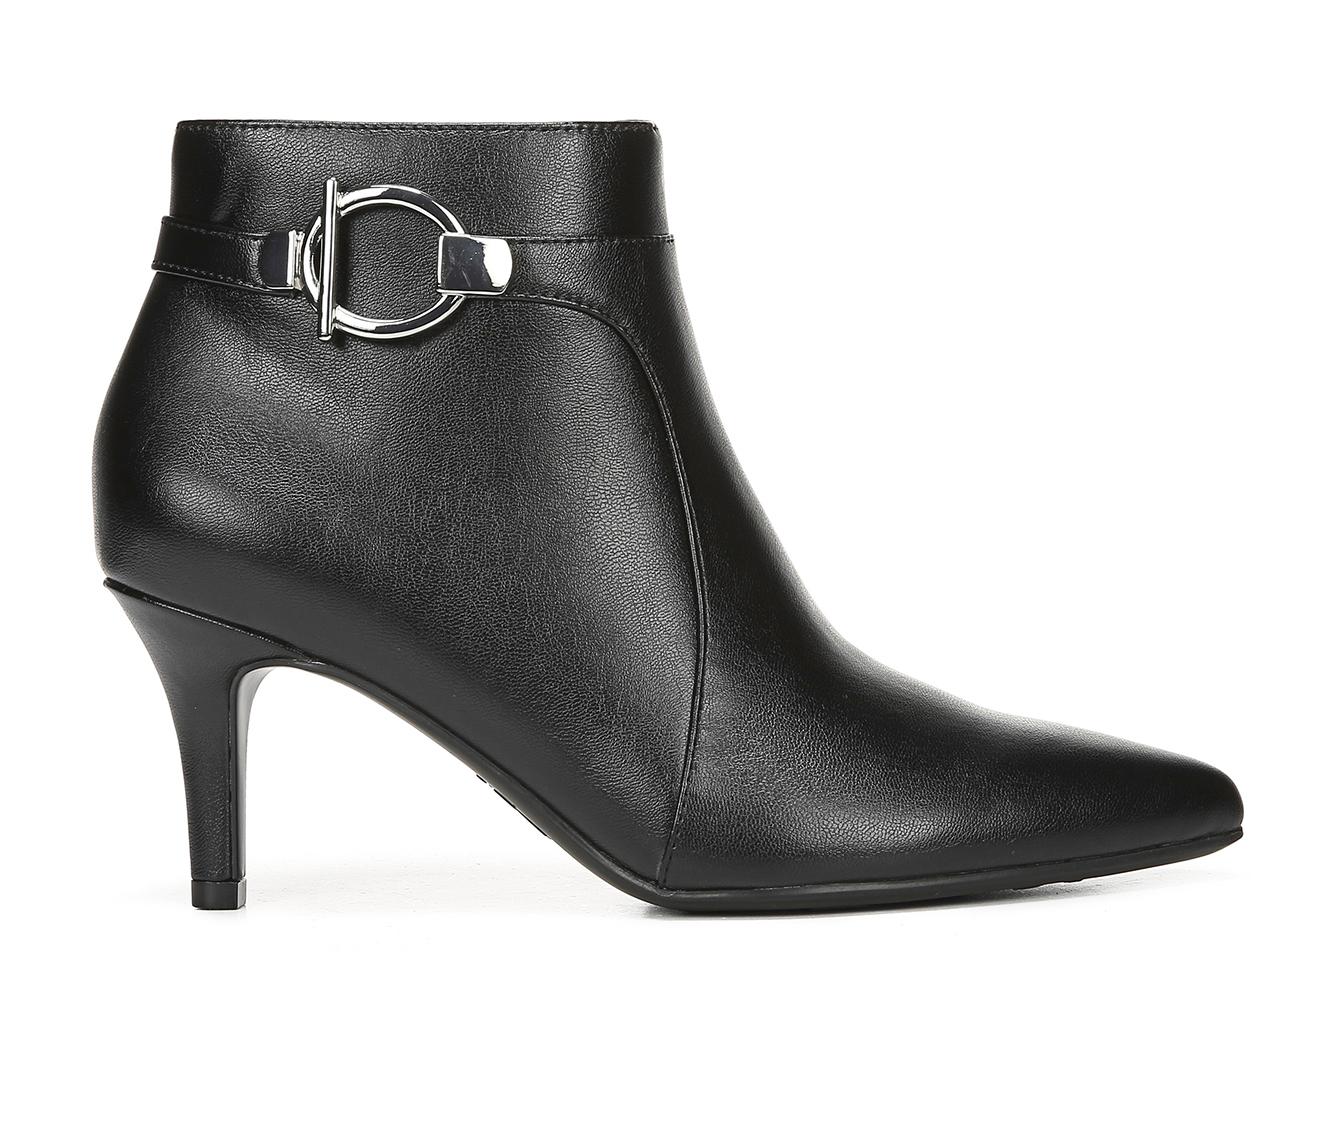 LifeStride Samara Women's Boots (Black - Faux Leather)